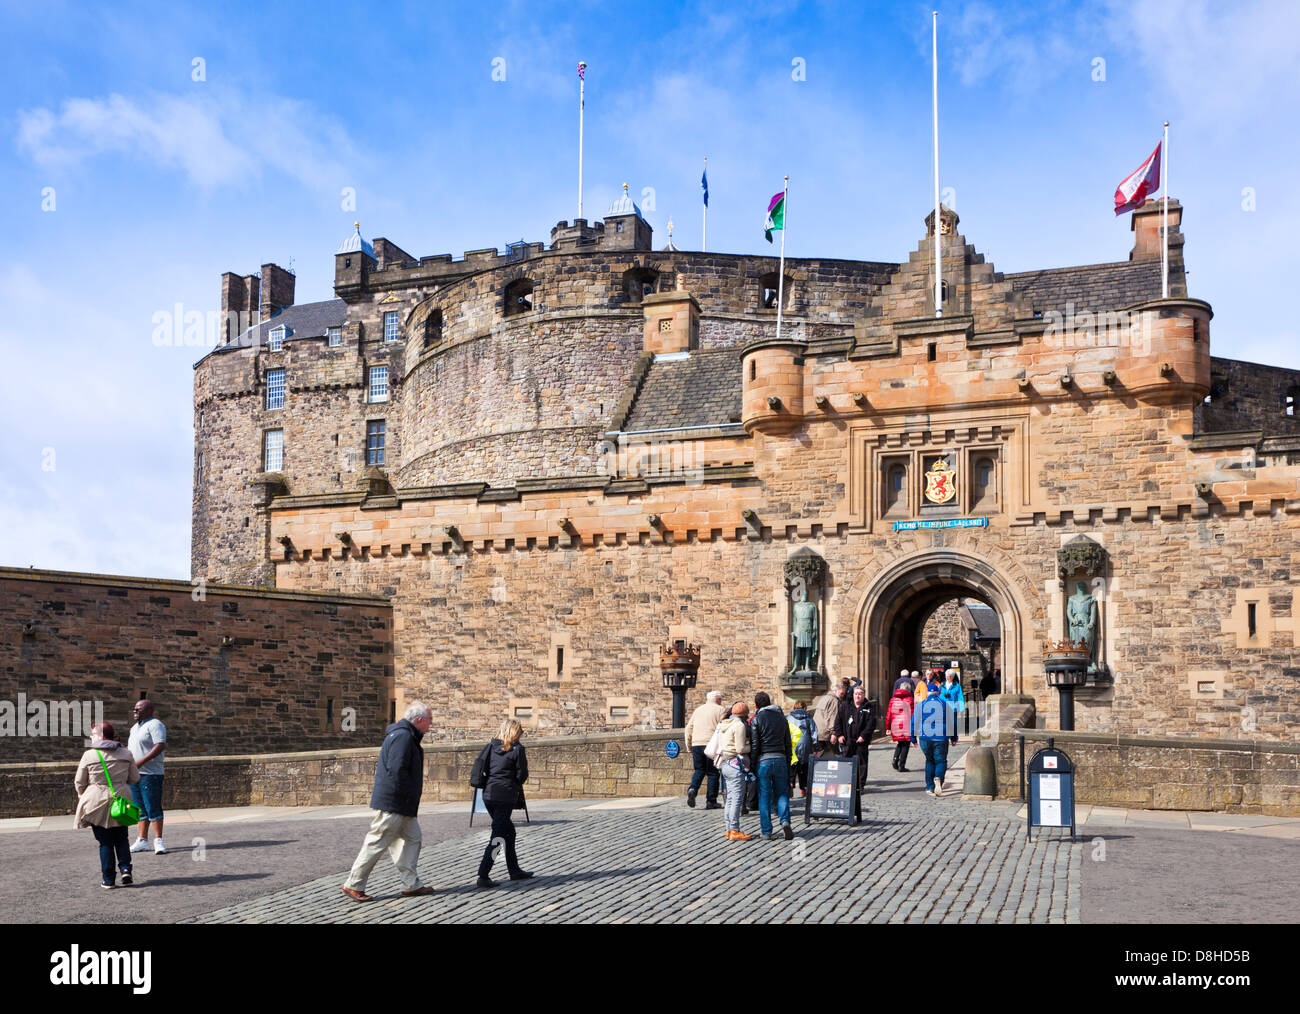 Edinburgh Schottland Edinburgh Touristen vor dem Eingang des Edinburgh Castle in der Altstadt Edinburgh Midlothian Stockbild